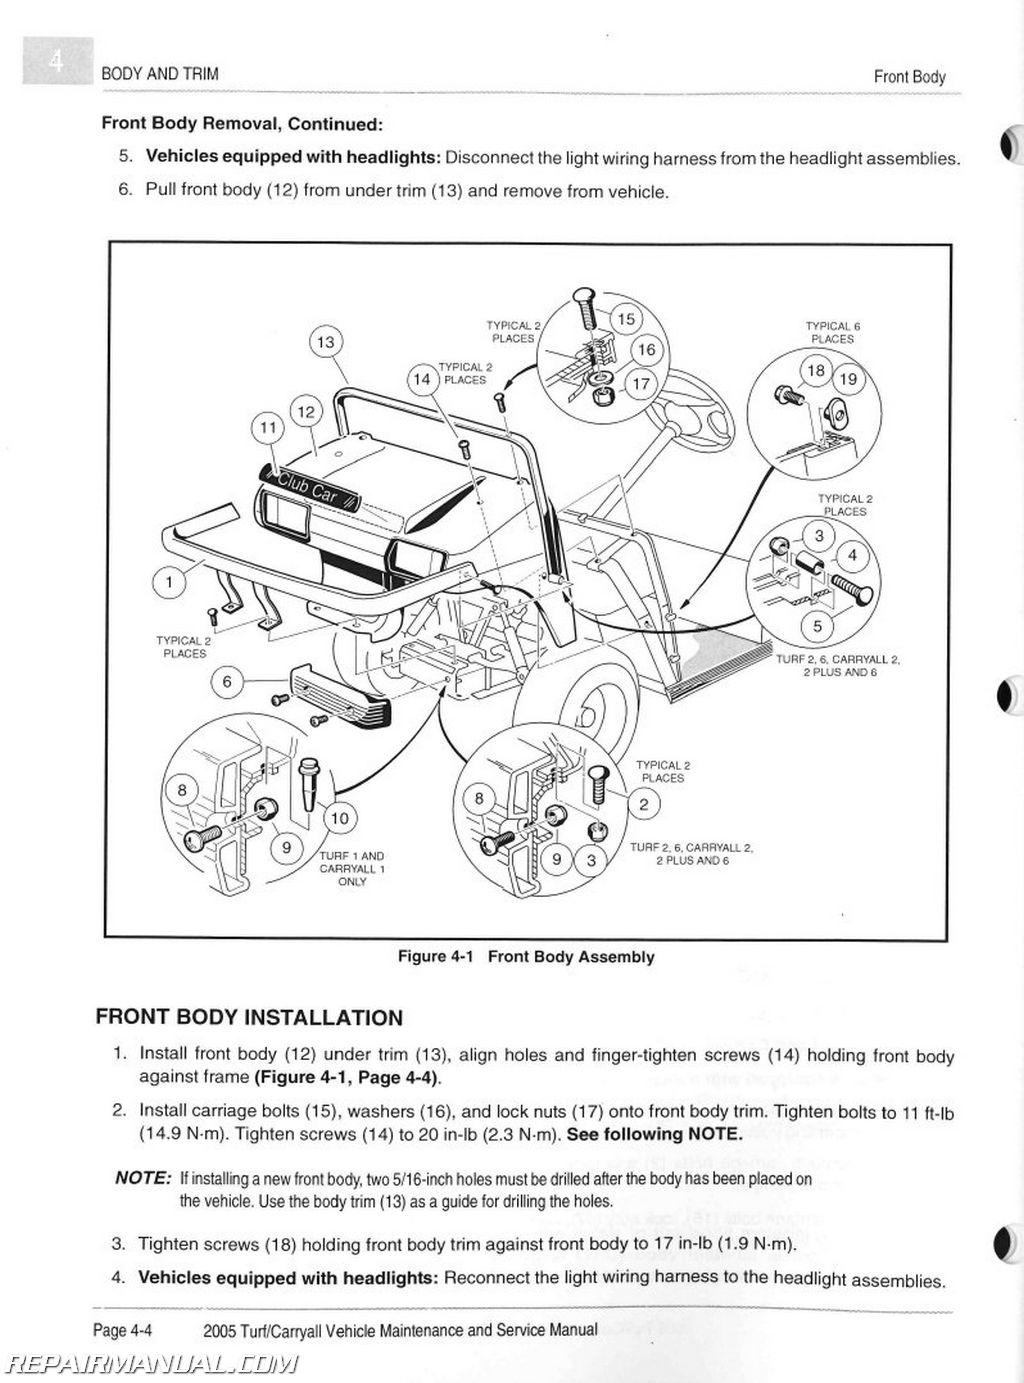 2000 Carry All 2 Wiring Diagram Headlights Electrical John Deere 5220 Tractor Library Rh 47 Bloxhuette De 2006 F350